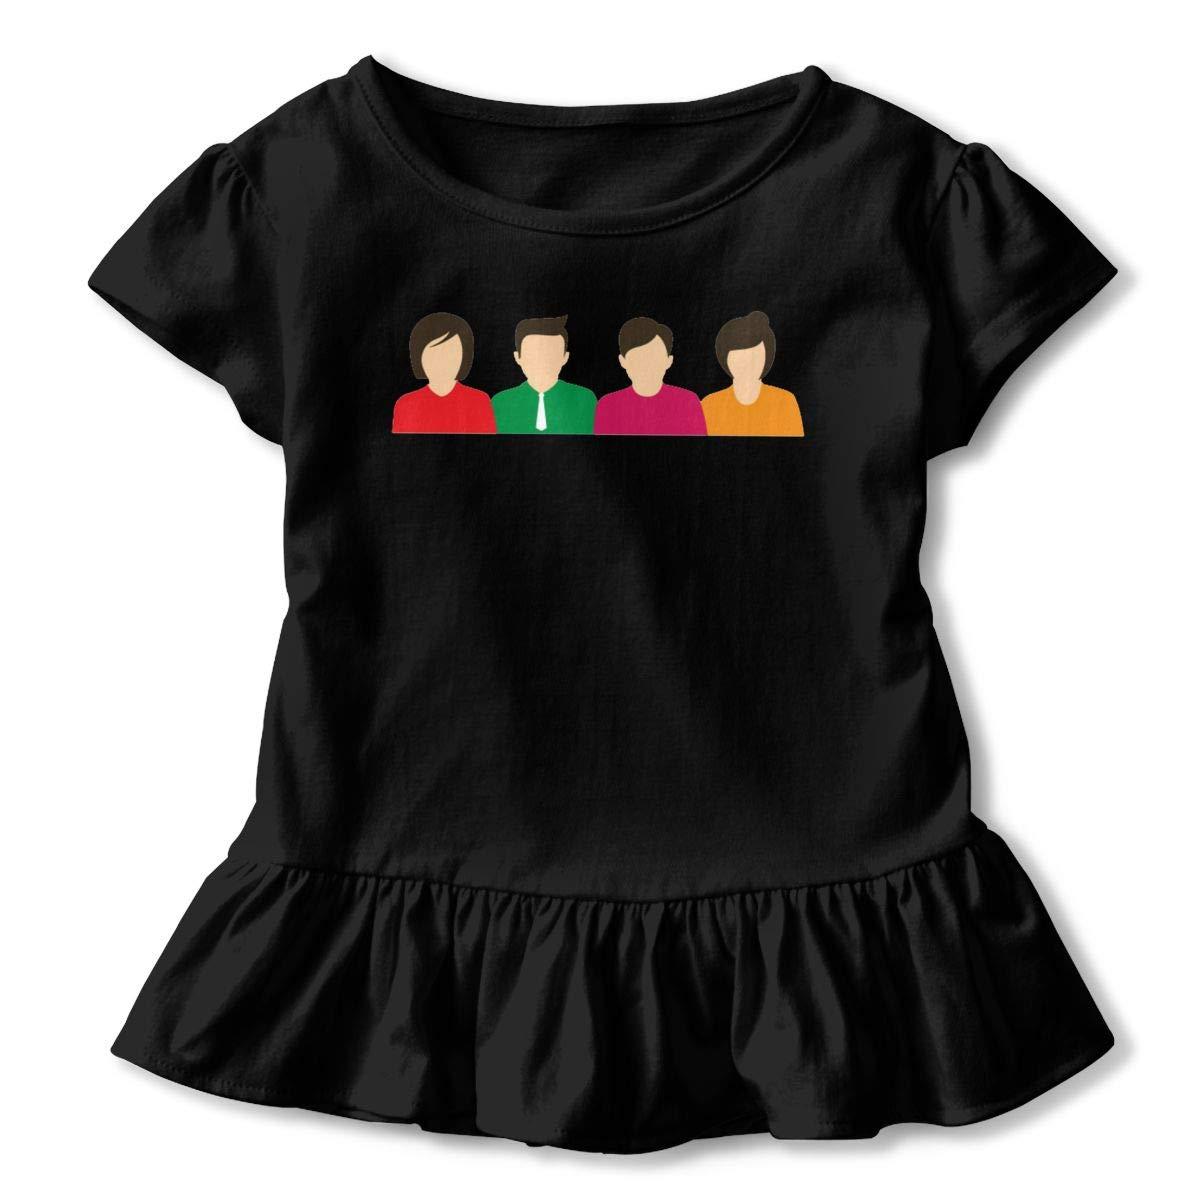 JVNSS Conversation Concept Shirt Fashion Kids Flounced T Shirts Graphic T-Shirt for 2-6T Kids Girls